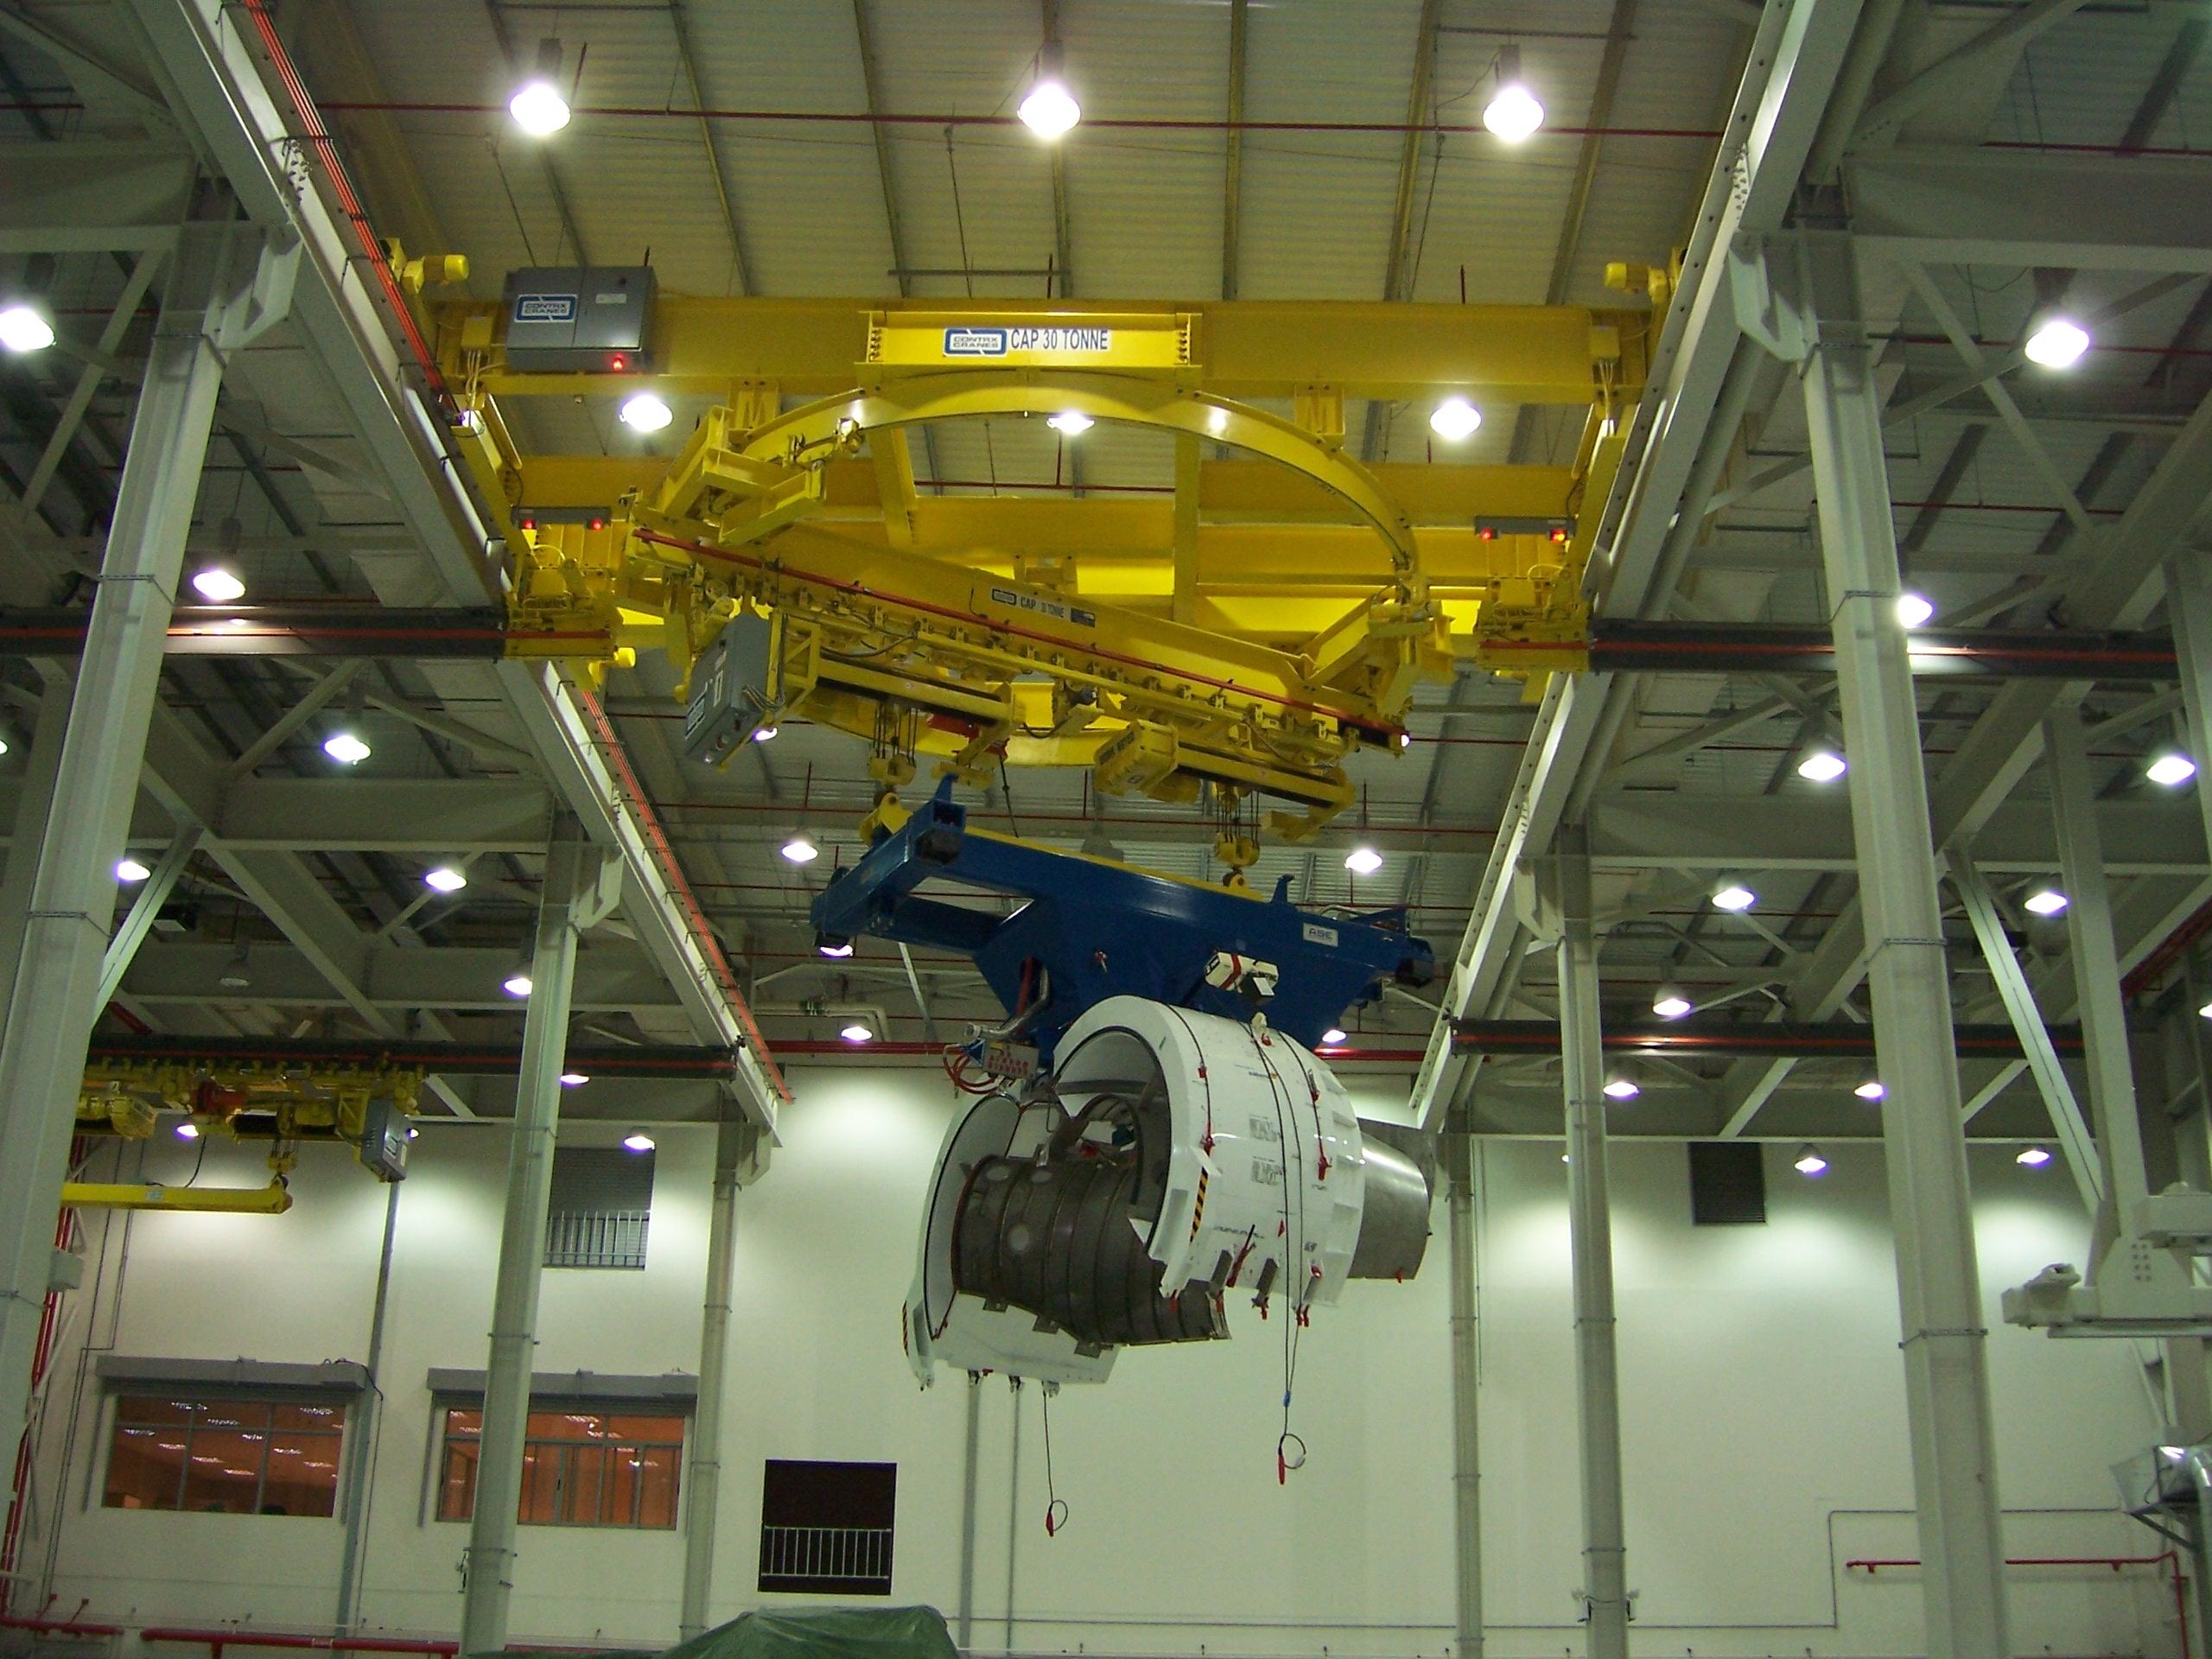 Acco Overhead Crane Solution for Aerospace Manufacturer